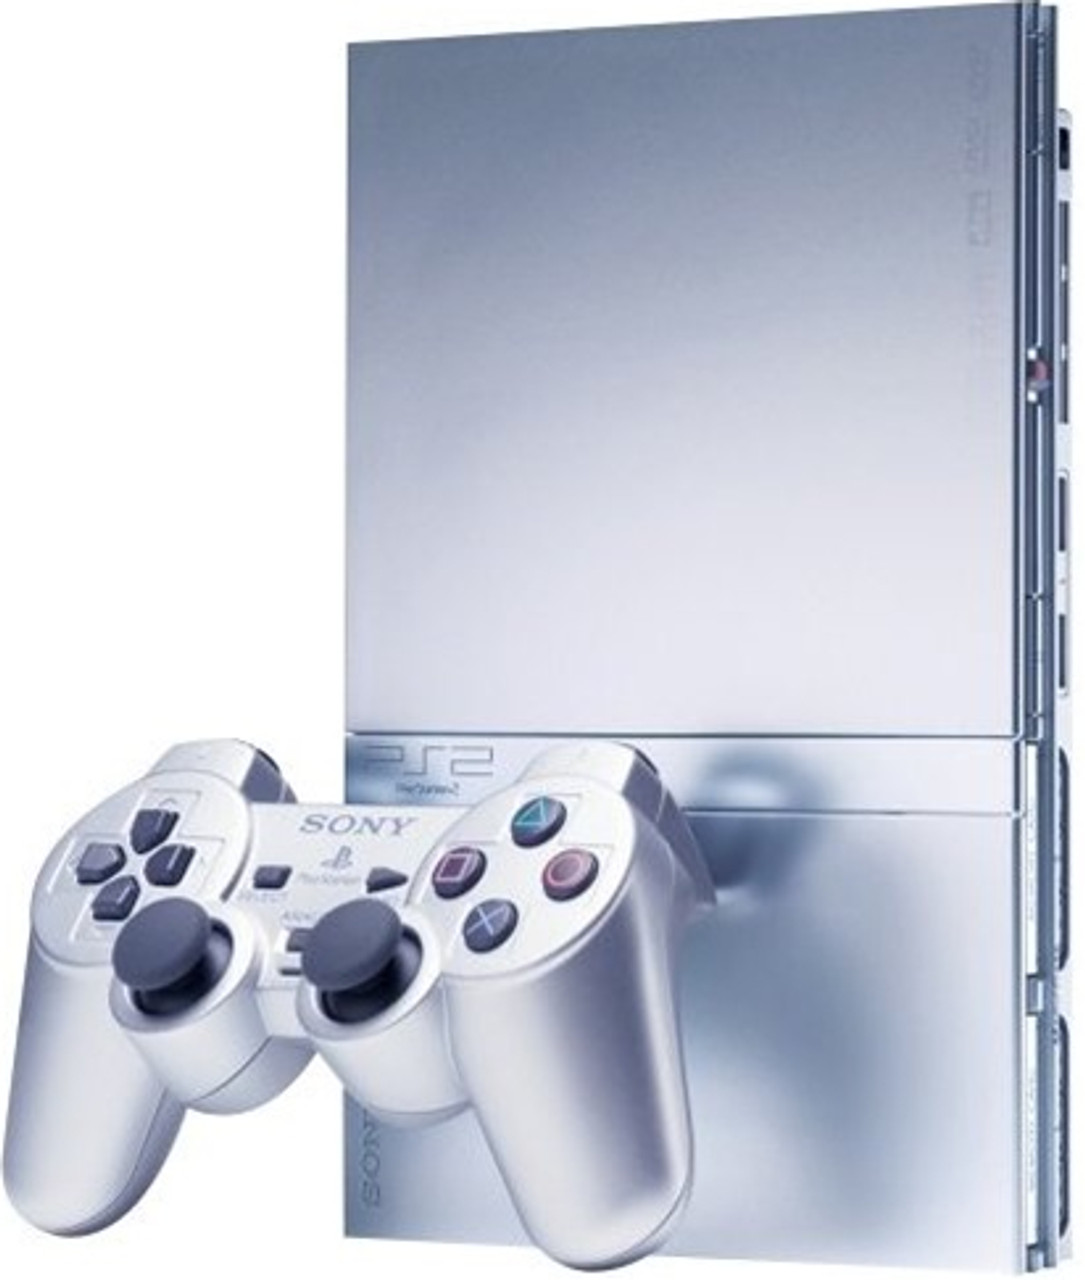 Silver Playstation 2 Slim Console Repair